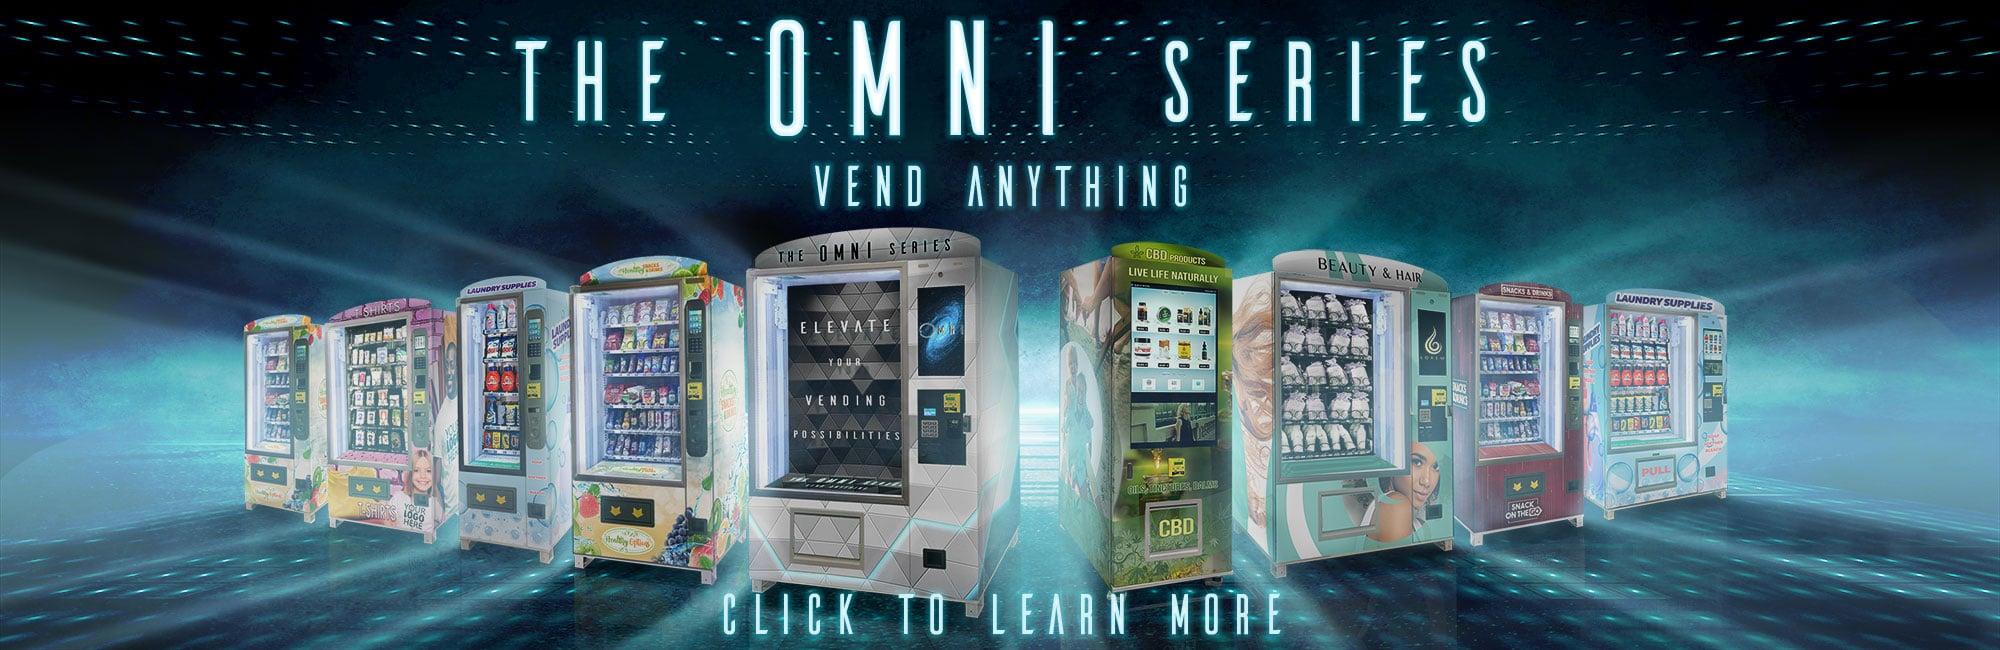 The OMNI Series